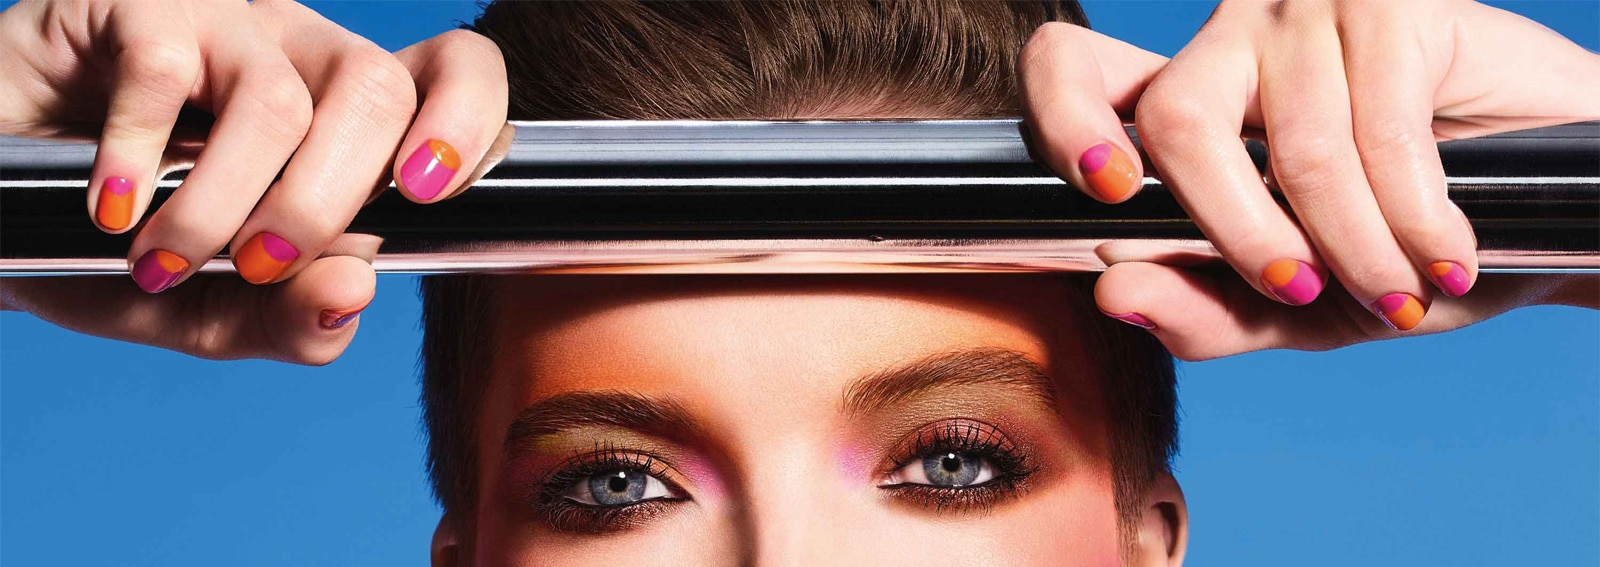 colori-unghie-primavera-estate-2020-cover-desktop-01